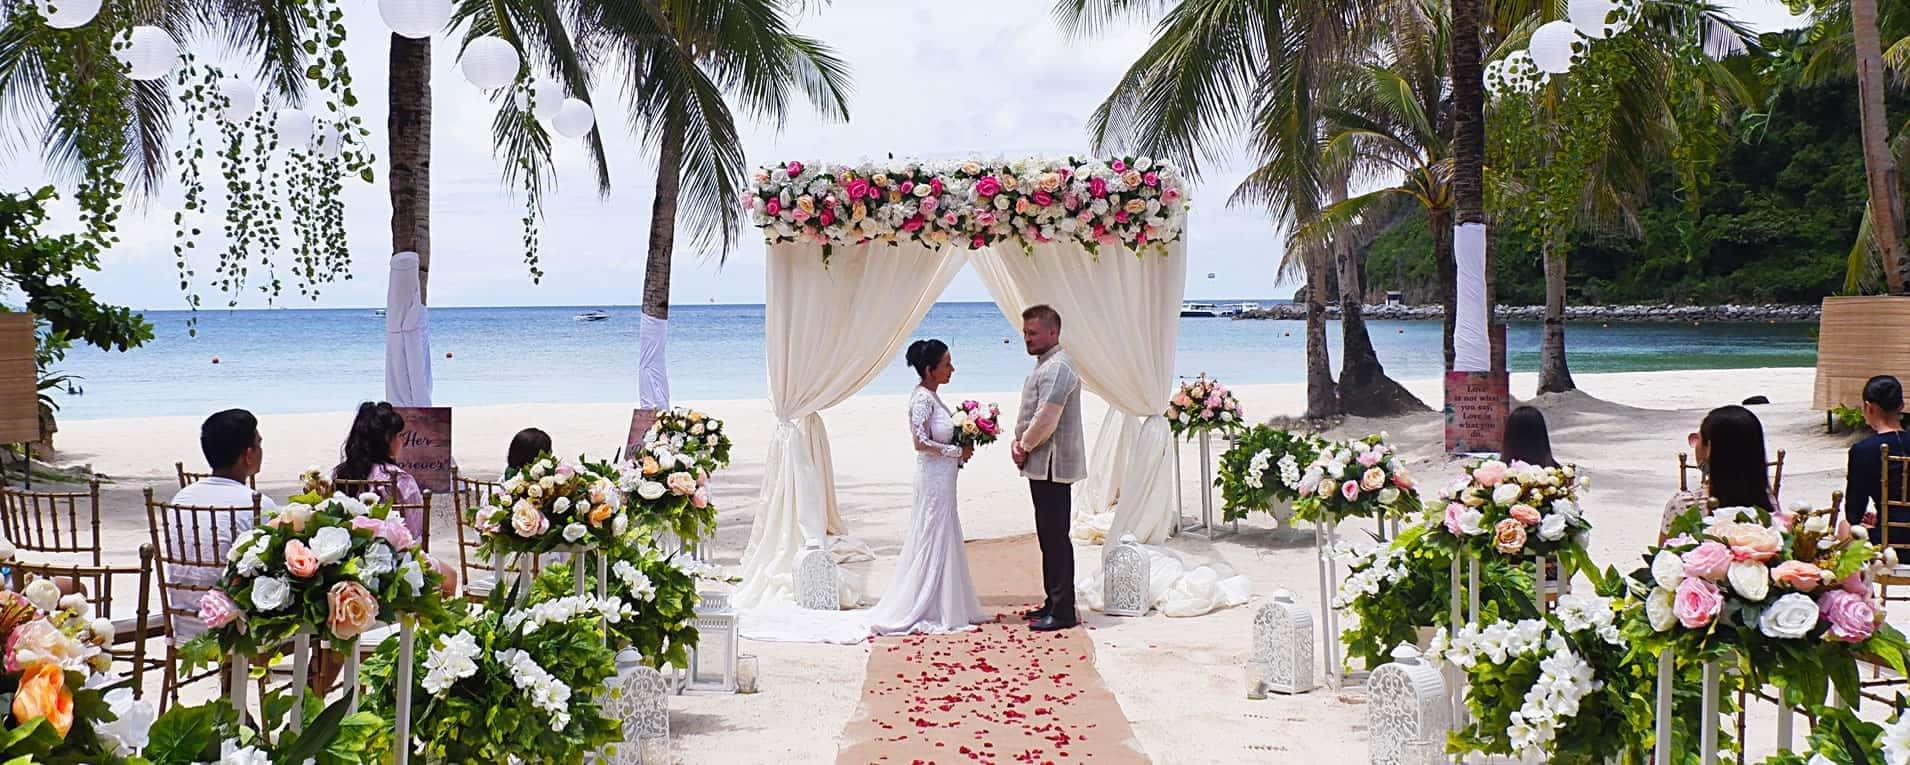 Fairways and Bluewater luxury resort, weddings, Boracay, Philippines